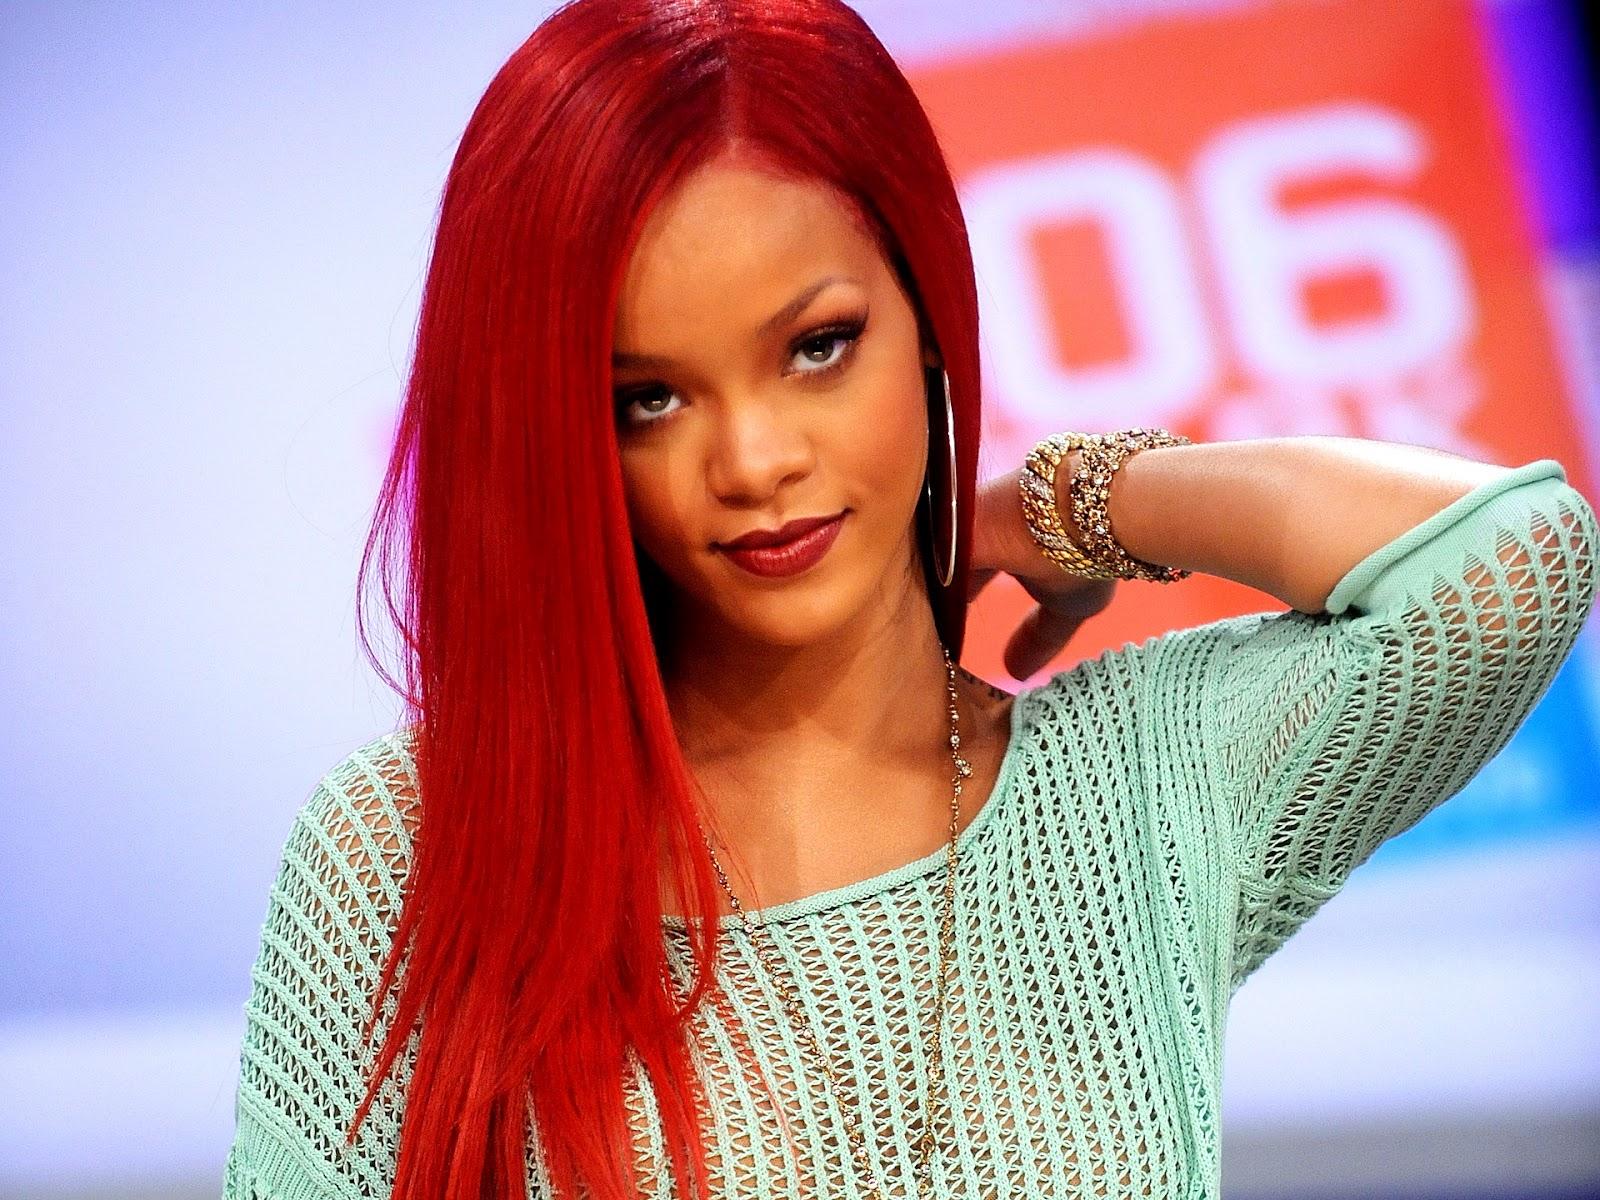 Free Celebrity Wallpapers Rihanna Wallpaper